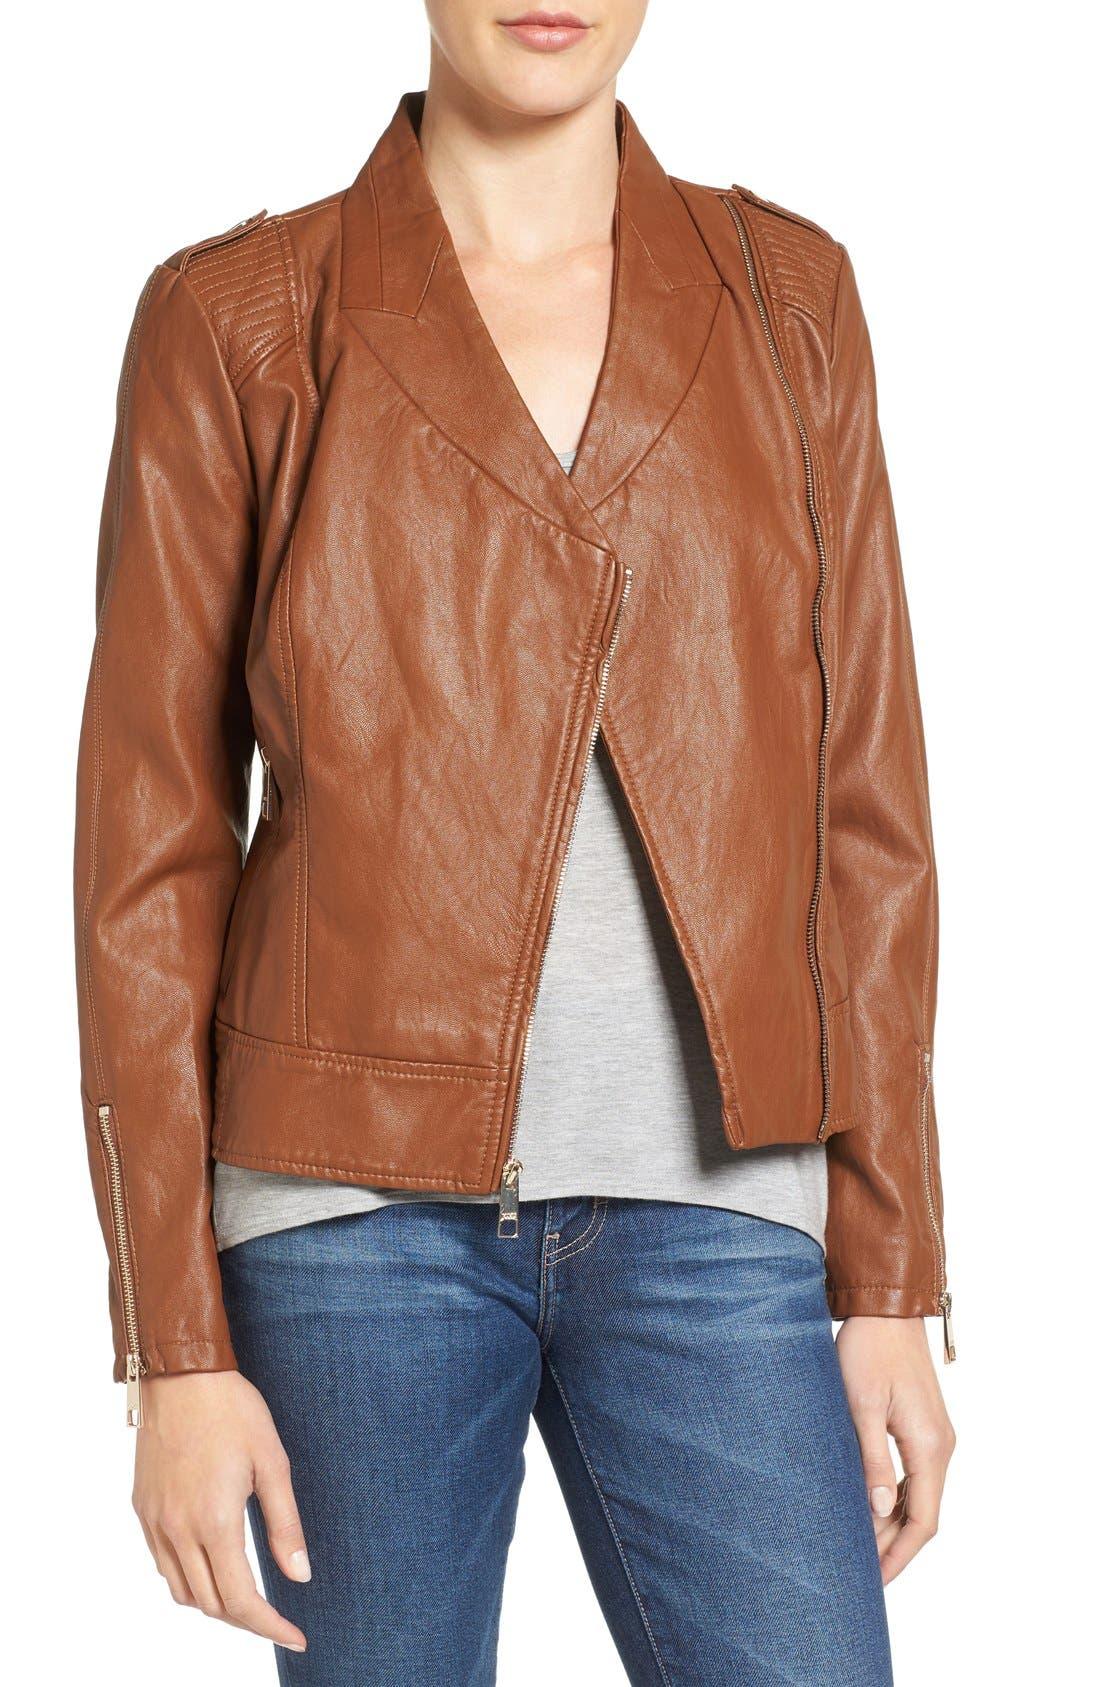 Alternate Image 1 Selected - GUESS Faux Leather Moto Jacket (Regular & Petite)